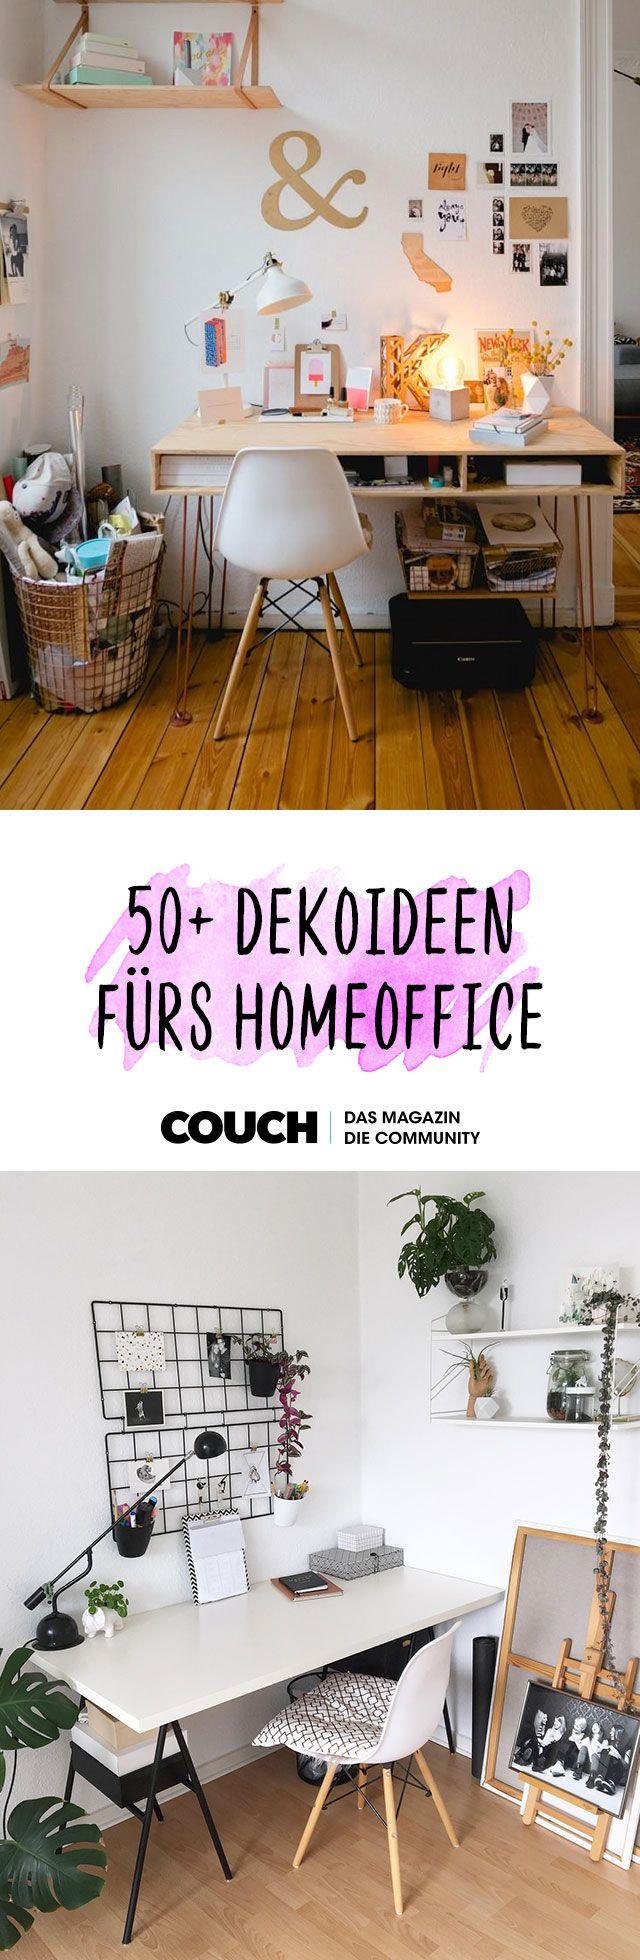 Homeoffice • Bilder & Ideen   Homeoffice einrichten   Pinterest